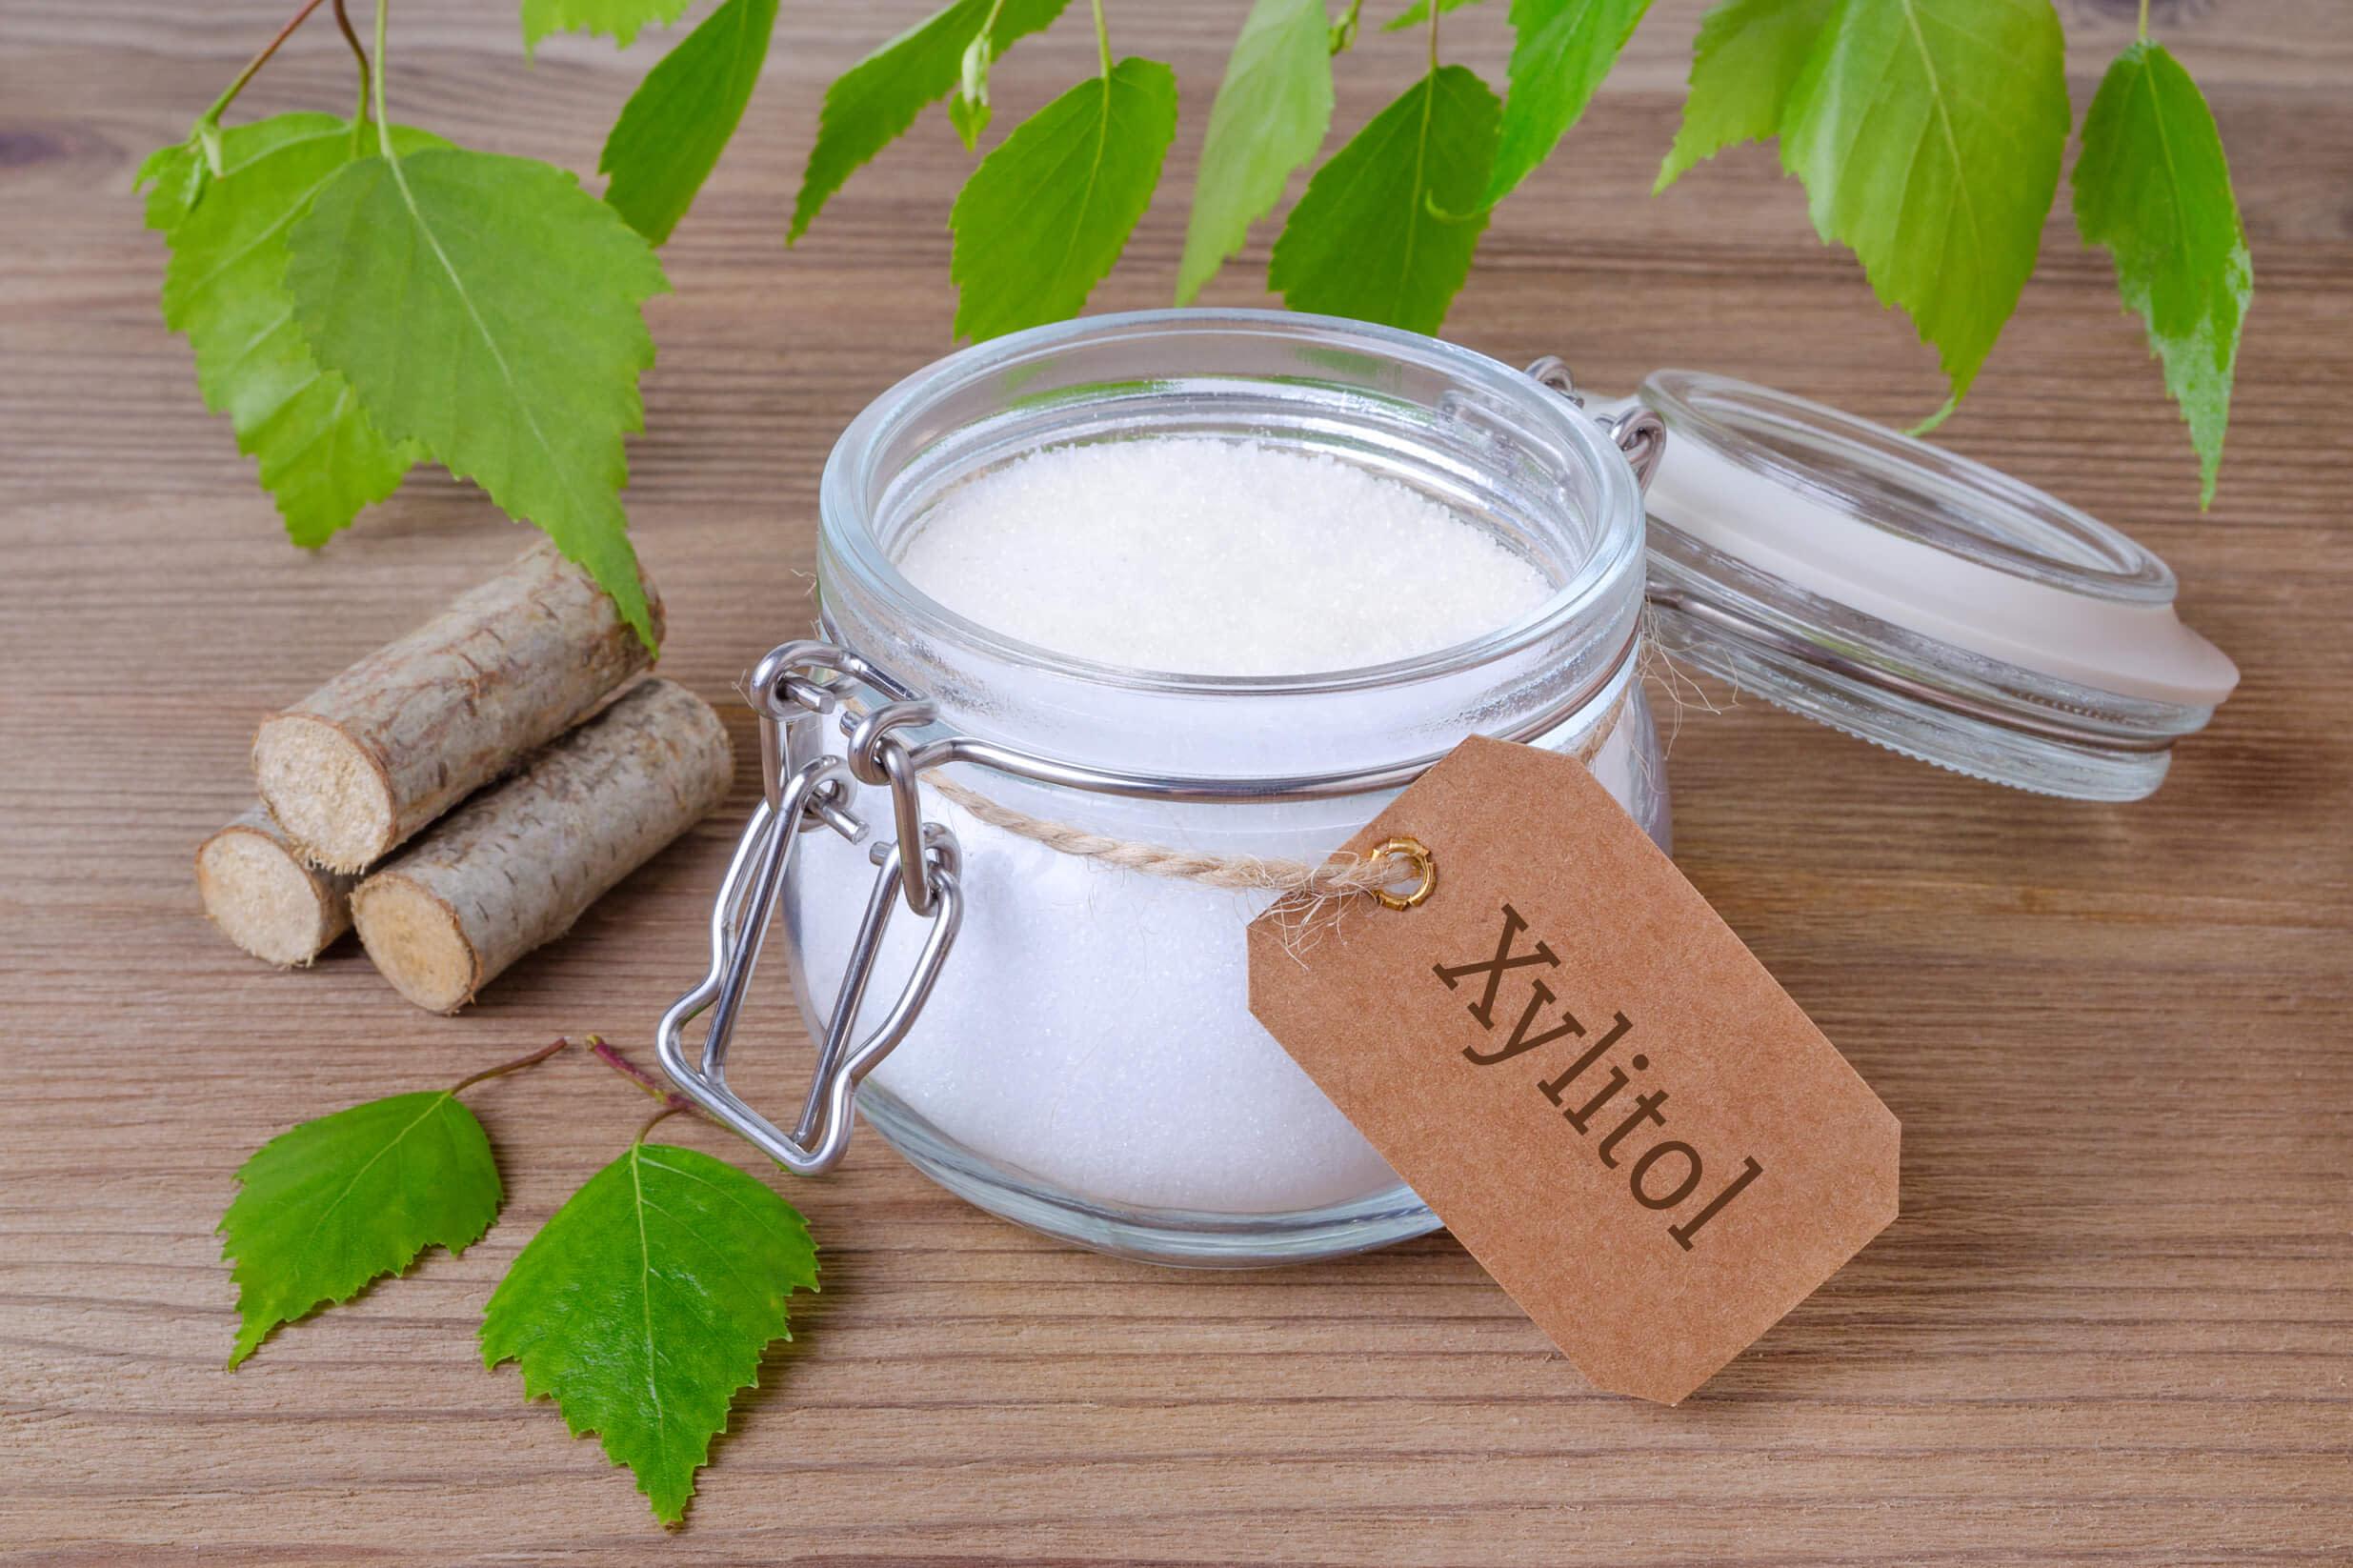 jar of xylitol